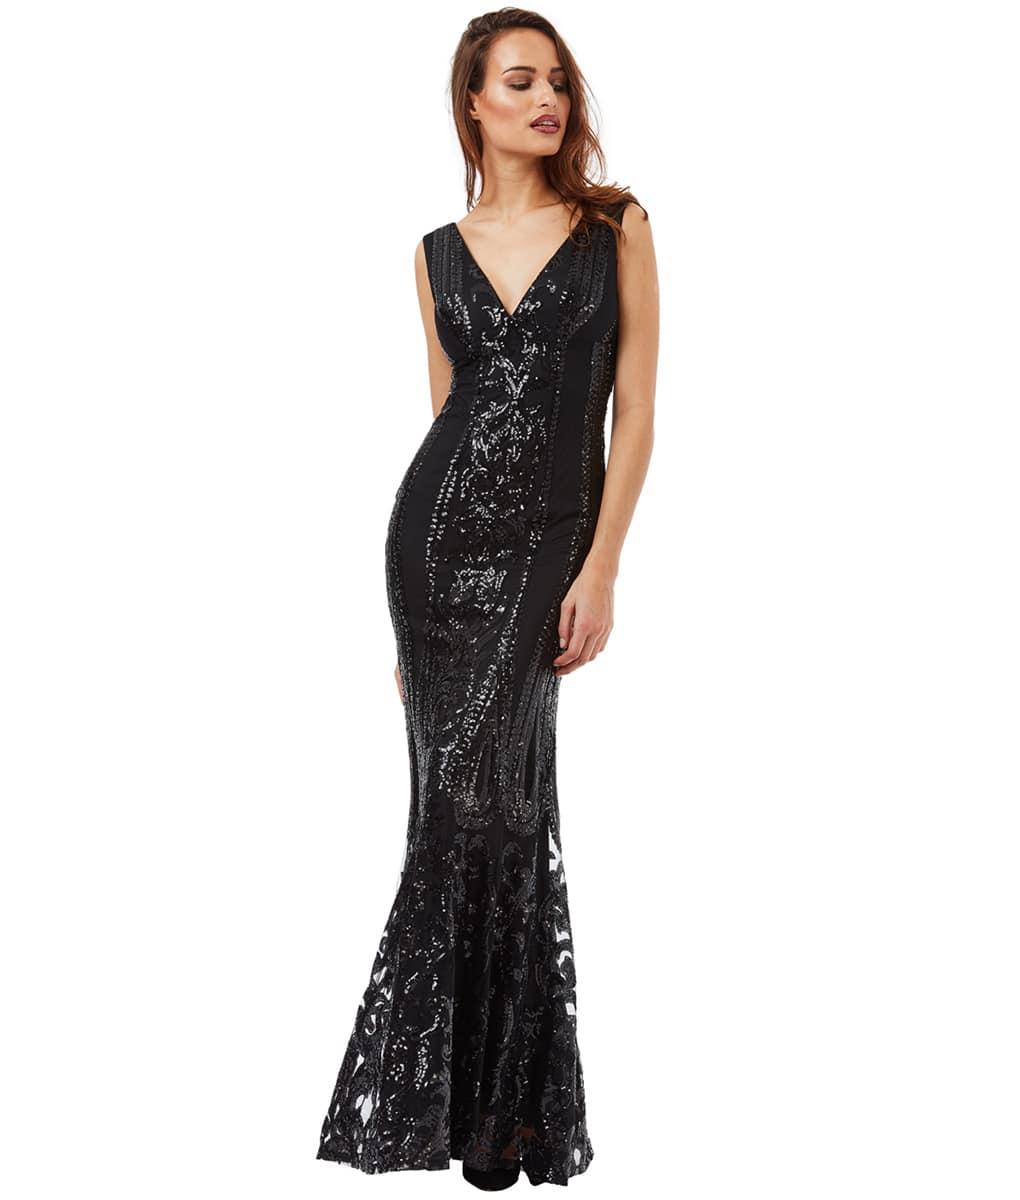 Alila-Black-Sequin-pattern-debs-dress-city-goddess